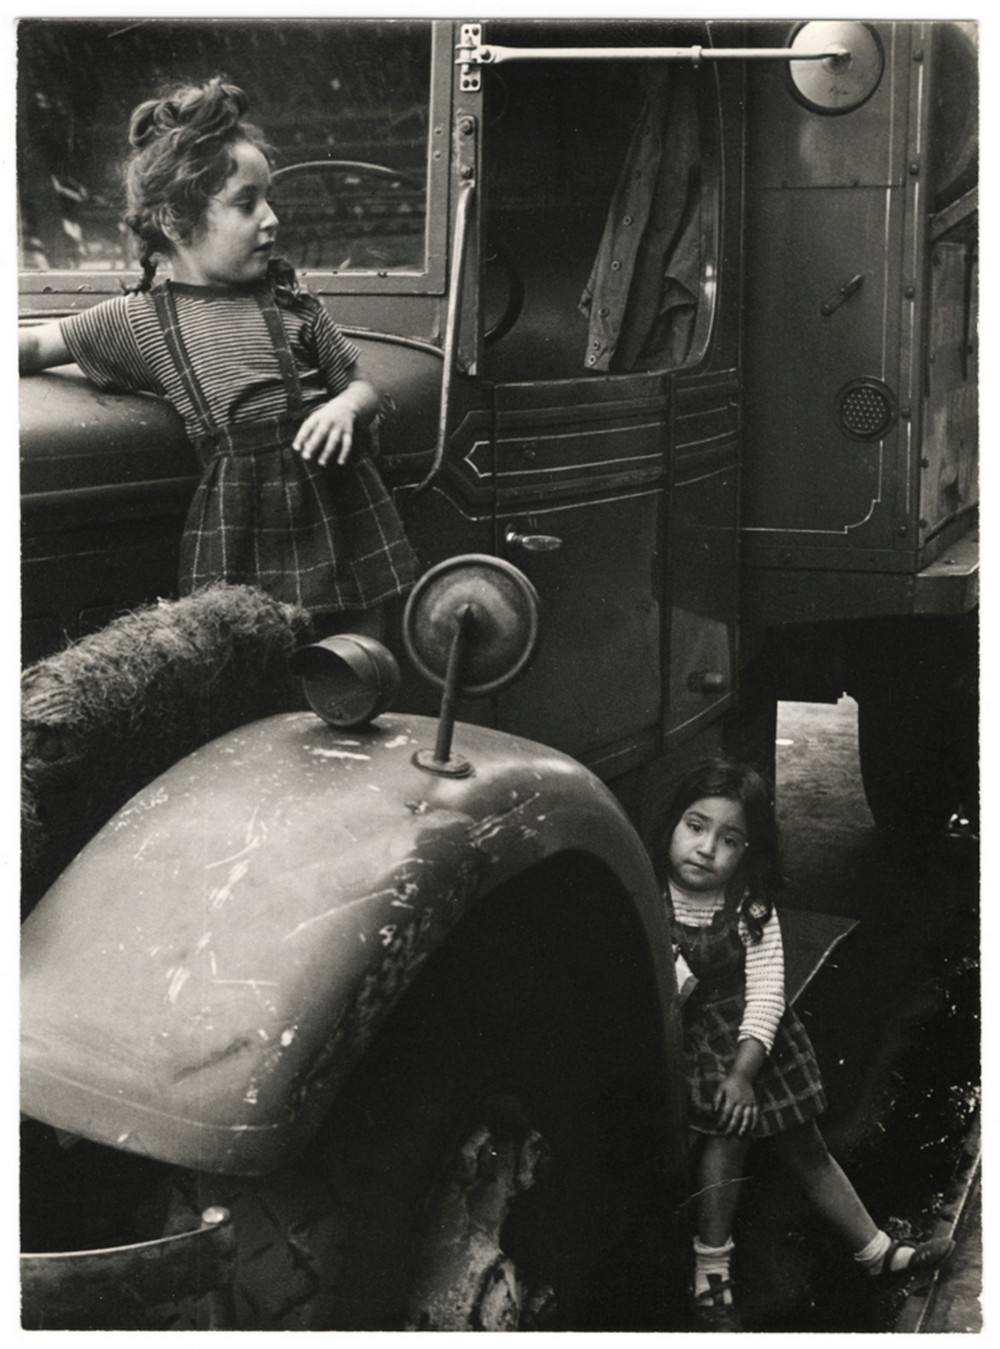 Уличная жизнь Нью_Йорка с 1930_х до 80_х годов в фотографиях Элен Левитт 5